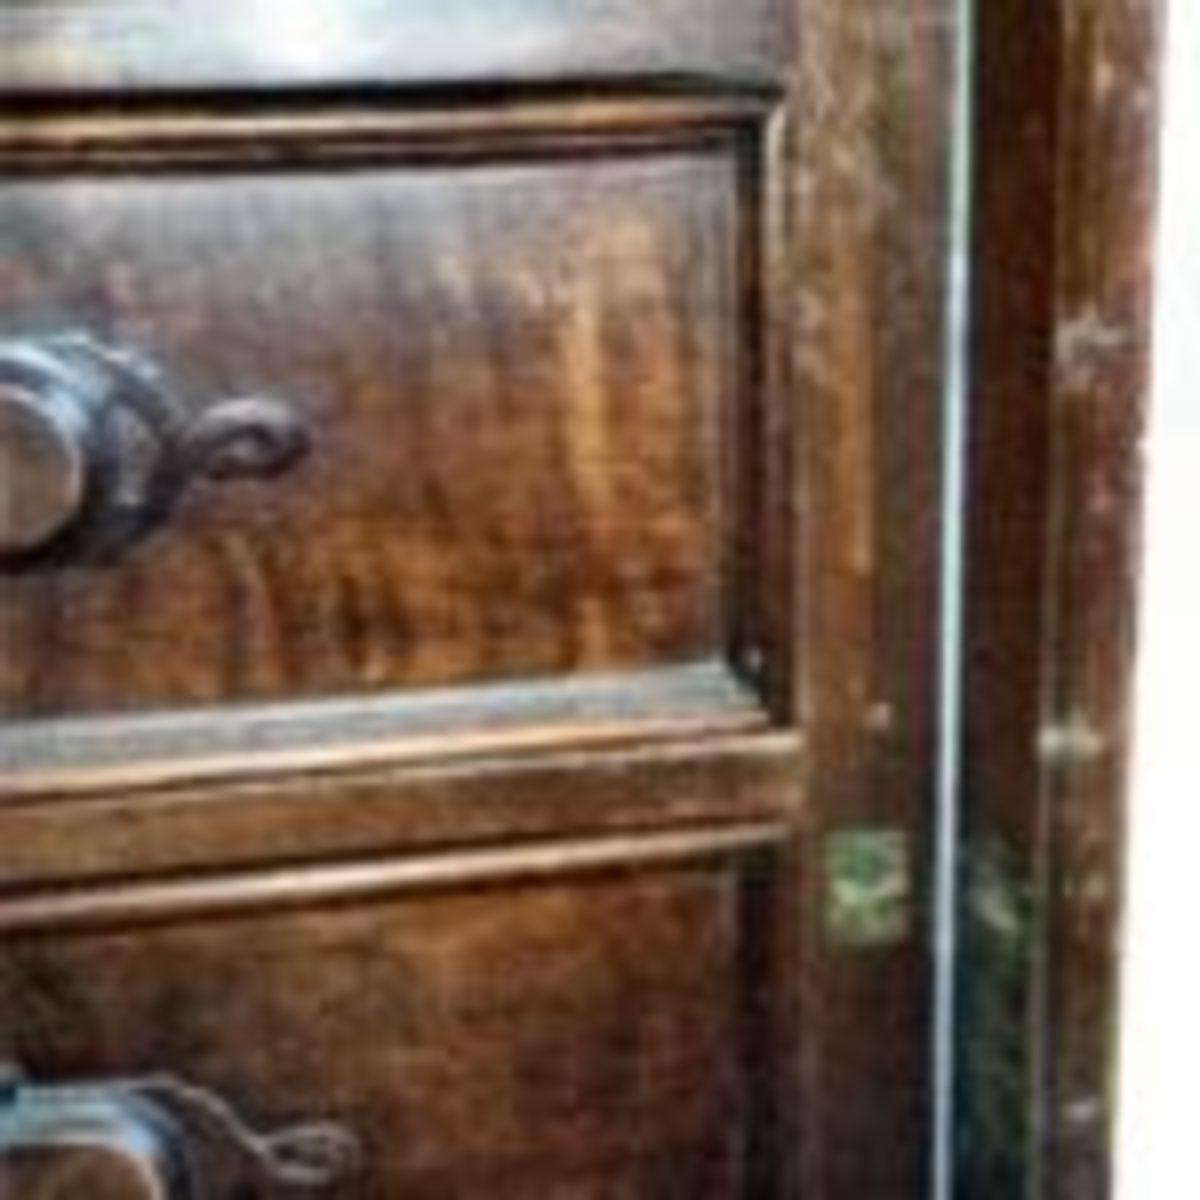 Locking detail of side-lock dresser